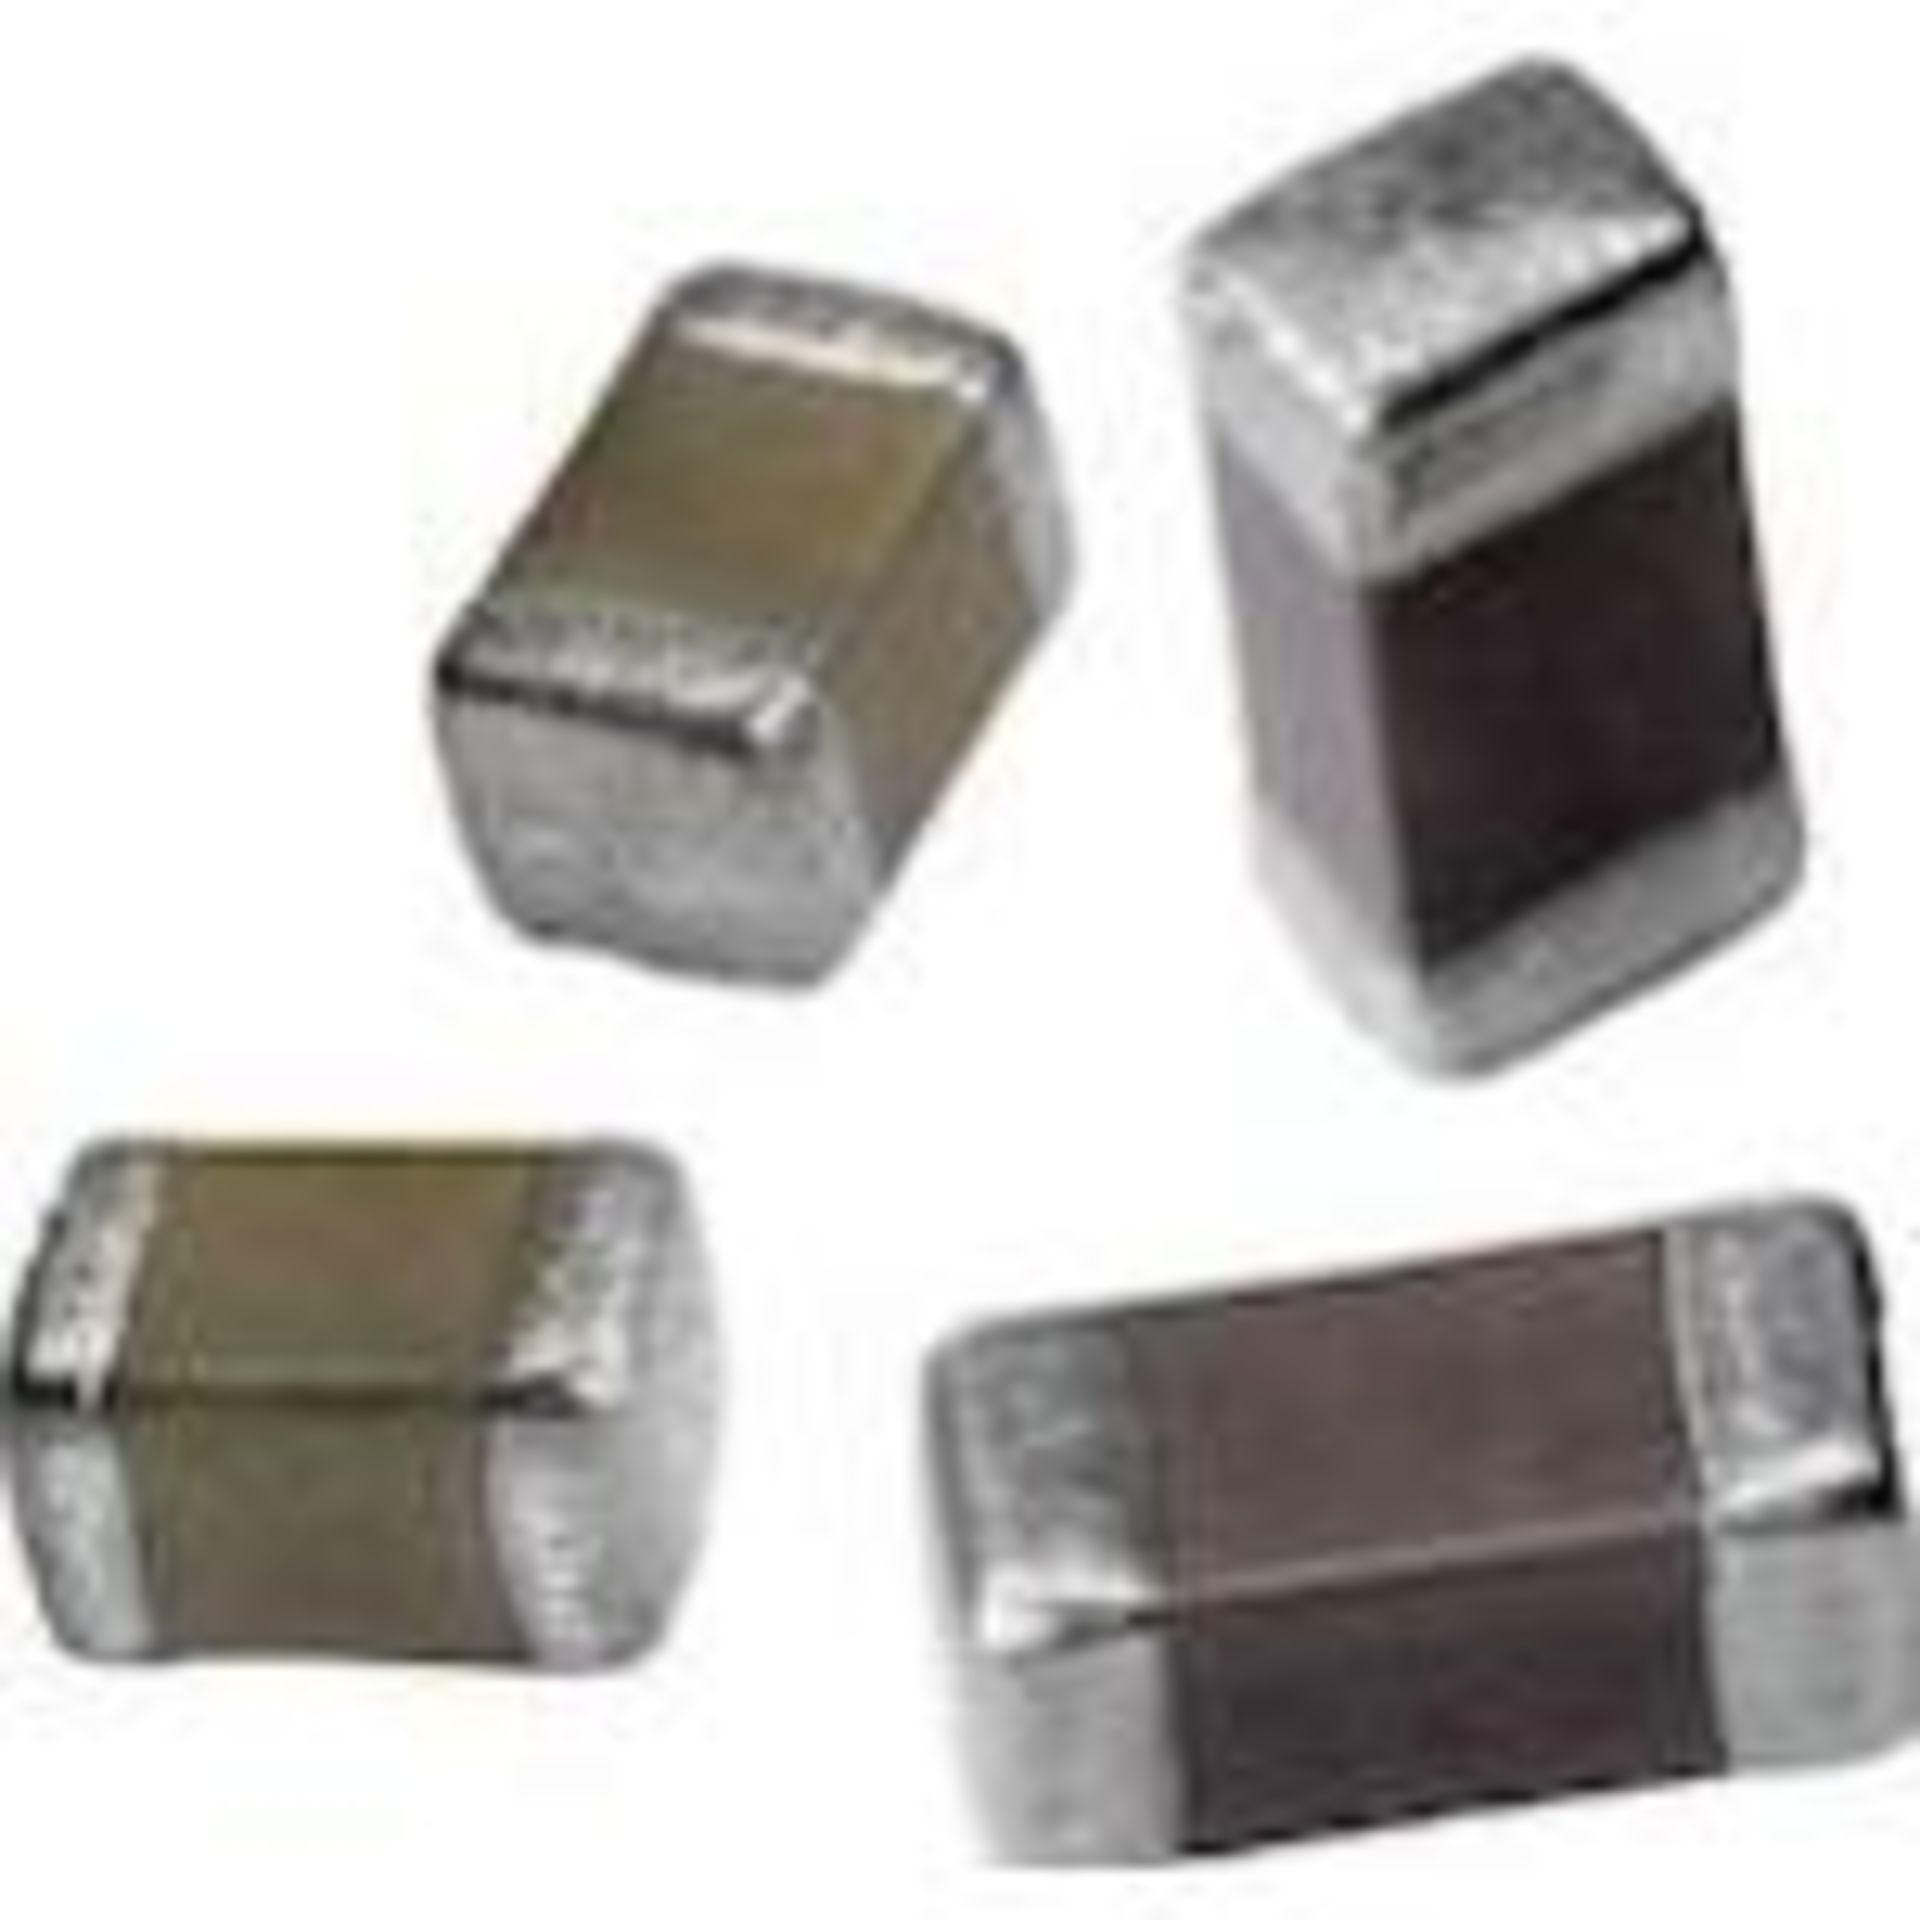 Vishay VJ0603Y104KXXMT, Cap Ceramic 0.1uF 25V X7R 10% Pad SMD 0603 150°C Automotive T/R, APROX QTY